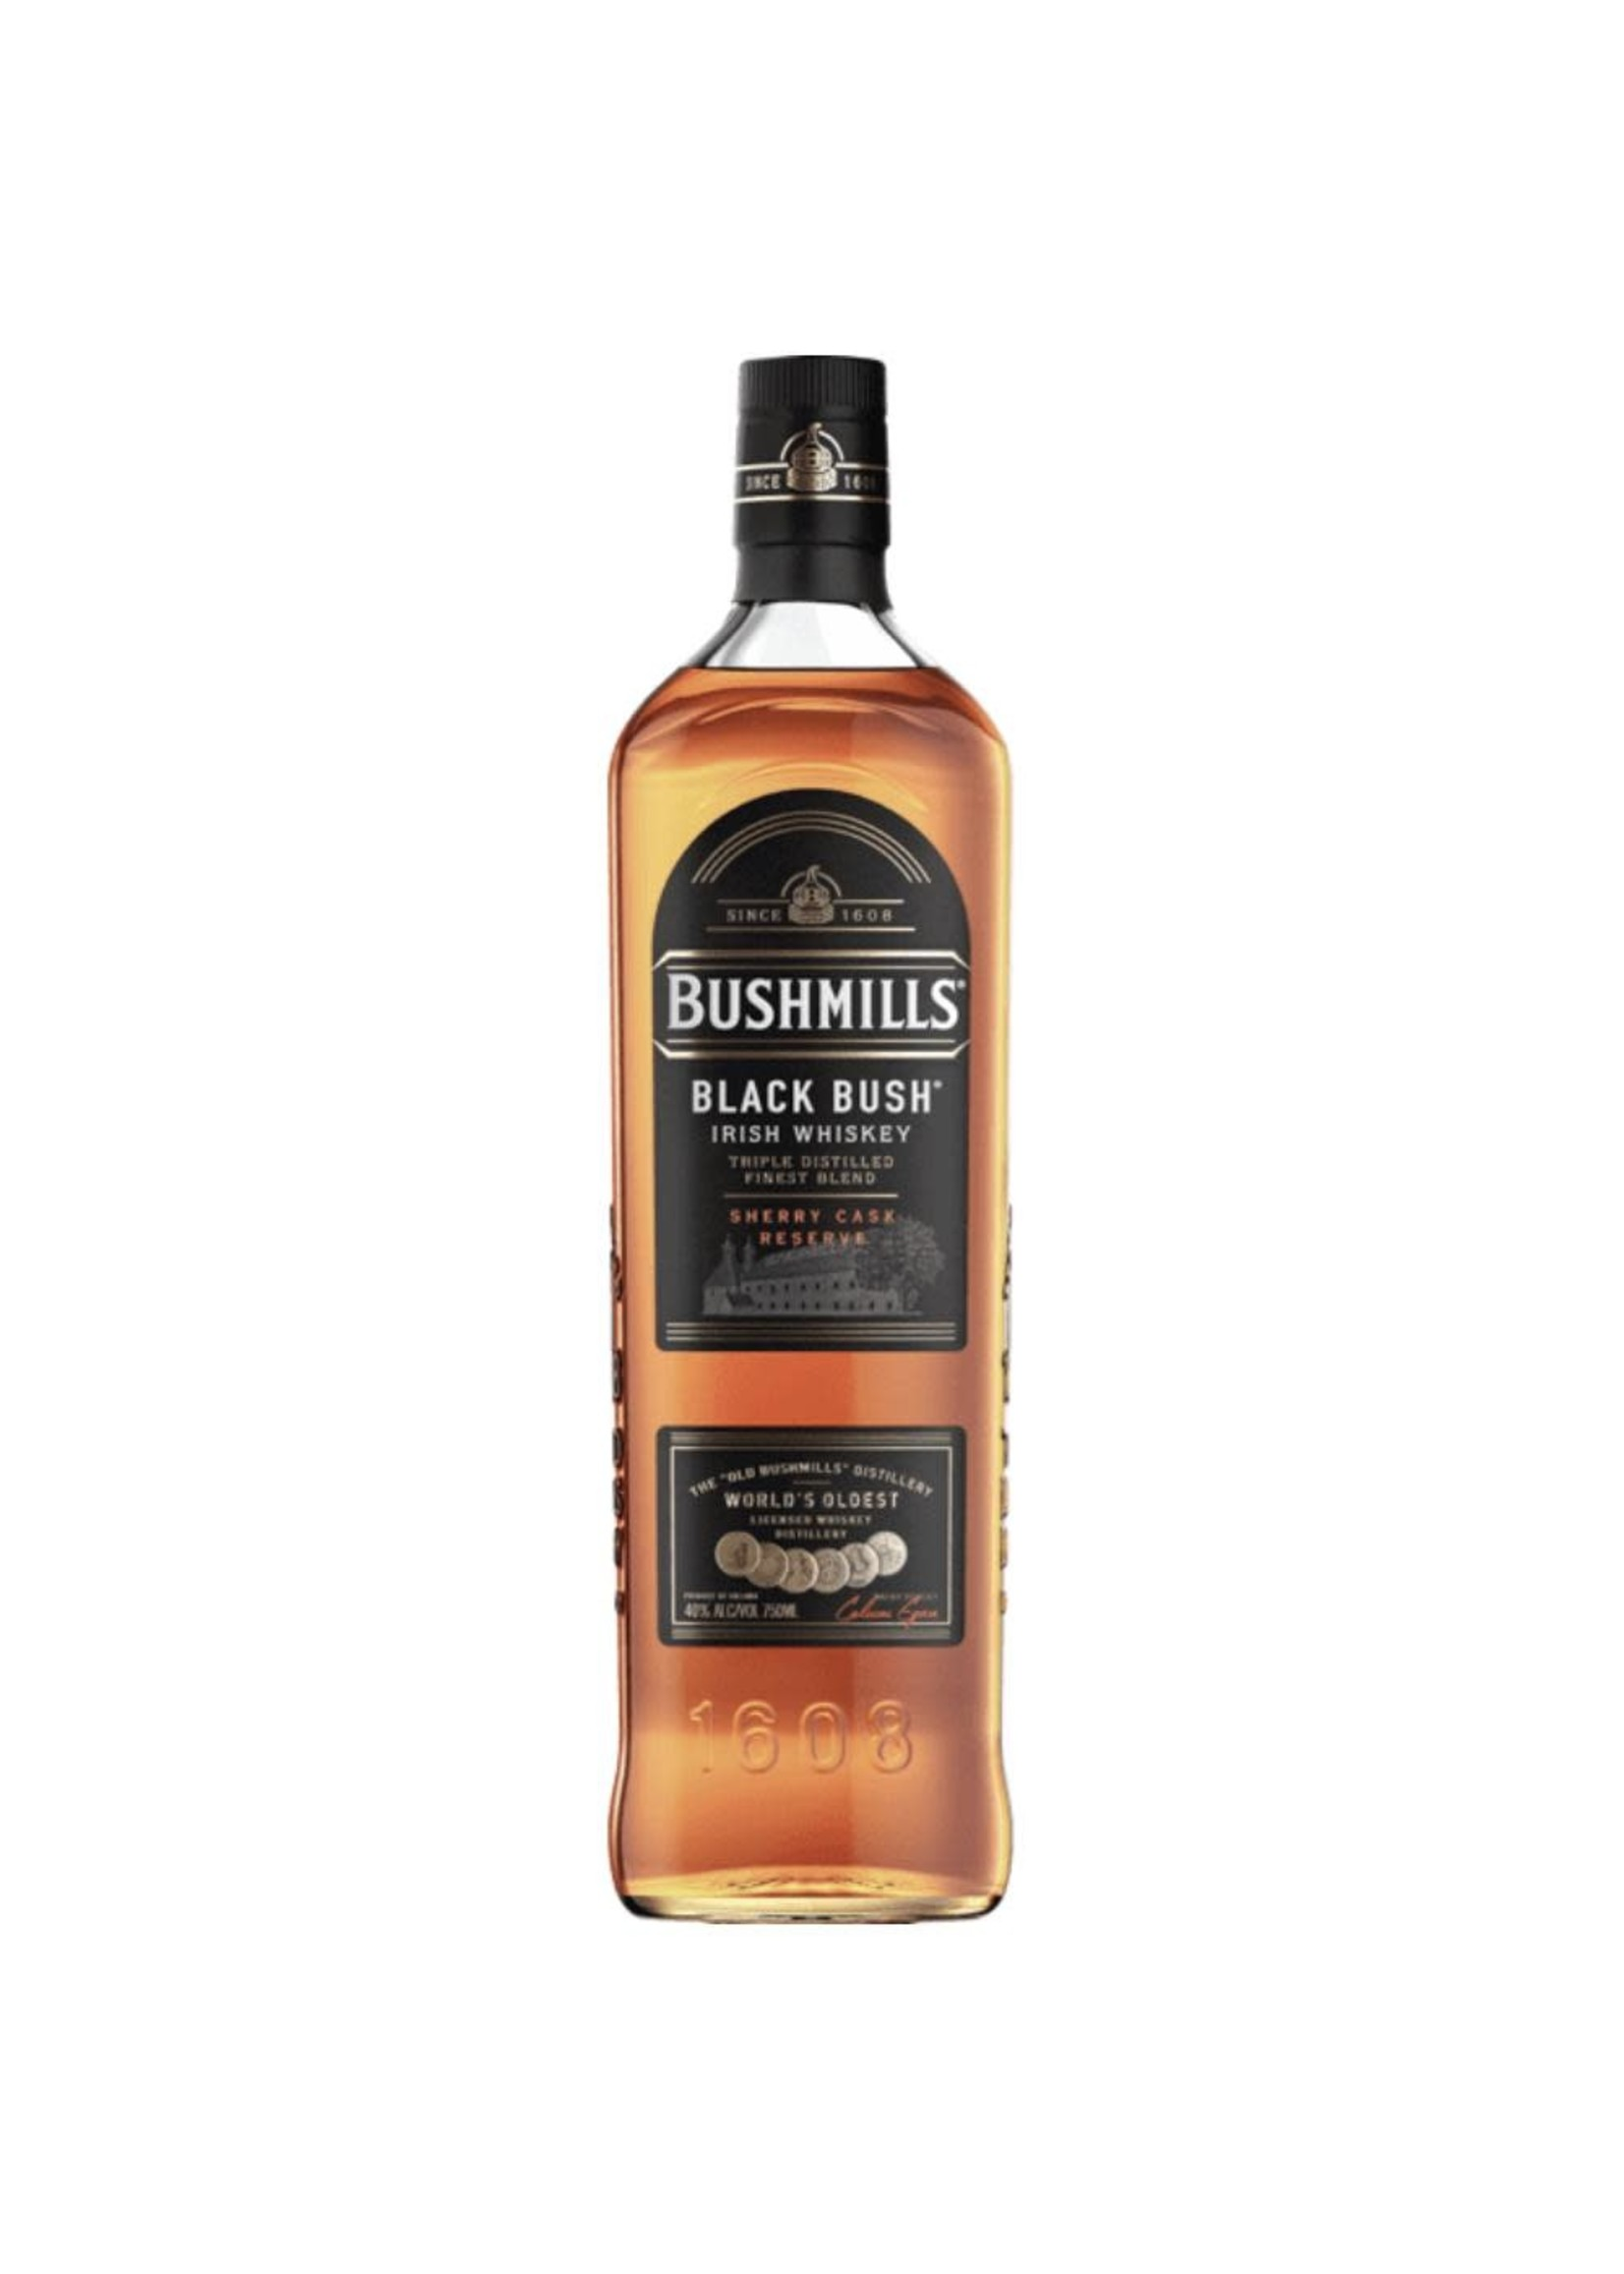 Bushmills Bushmills / Black Bush Triple Distilled Irish Whiskey / 750mL